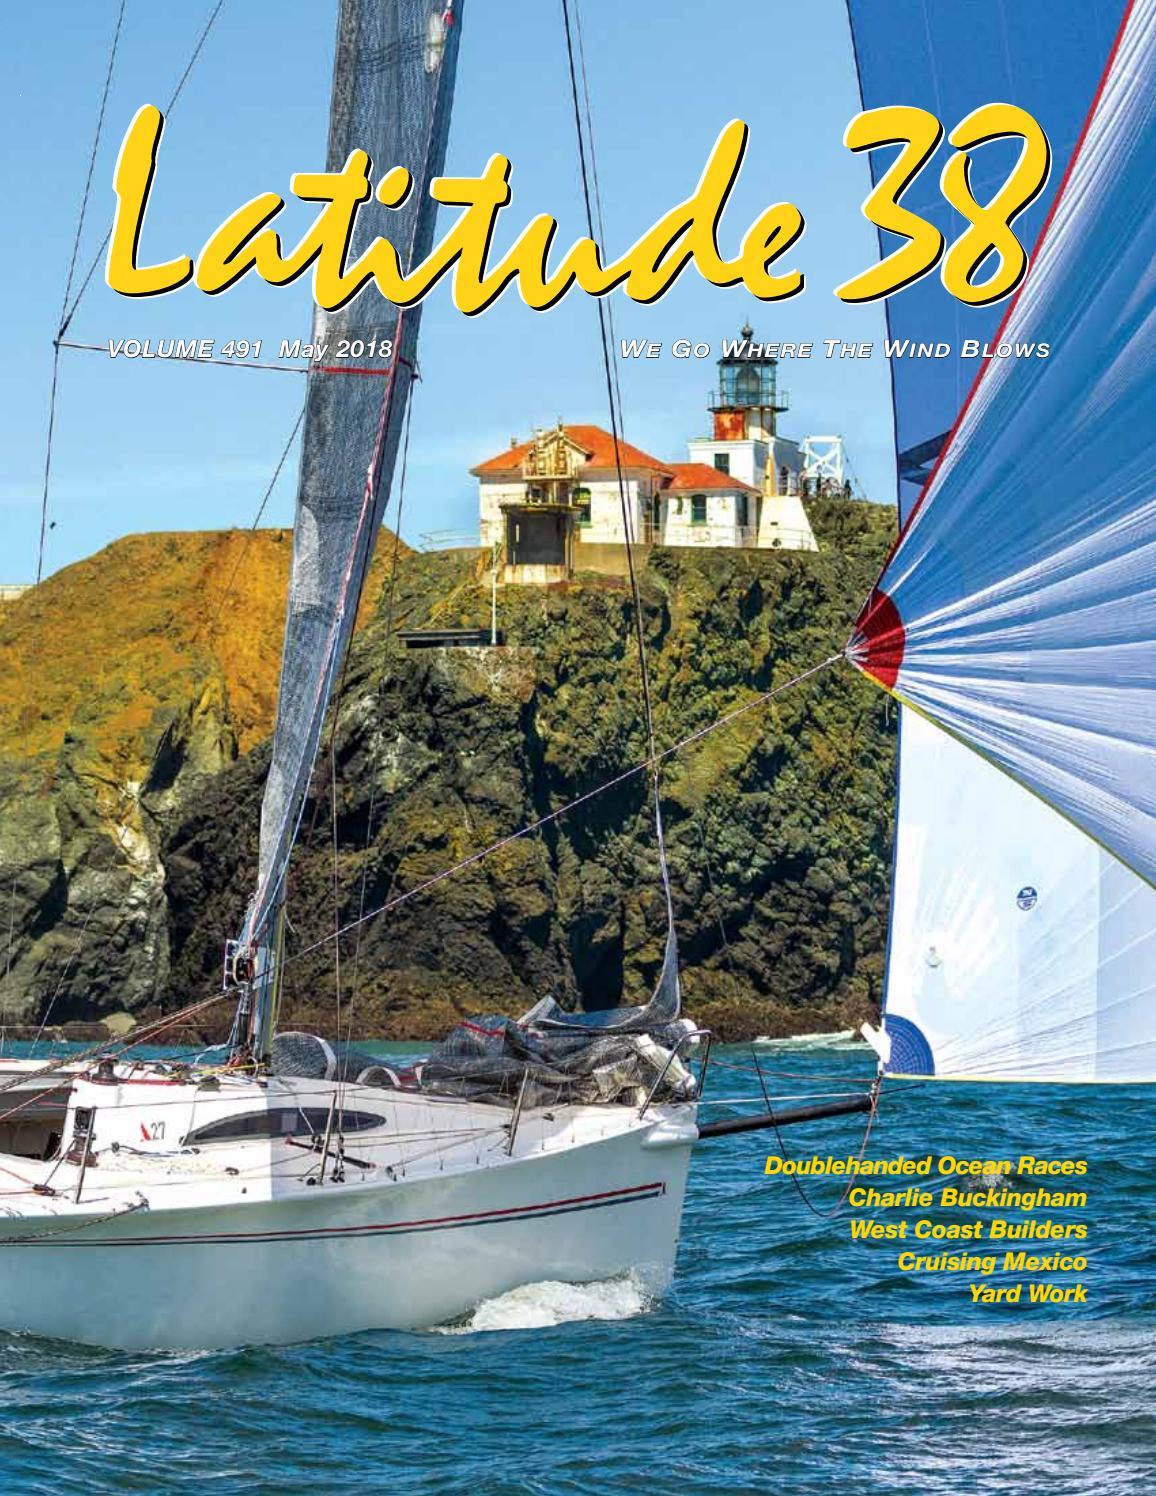 Latitude 38 May 2018 by Latitude 38 Media, LLC - Issuu